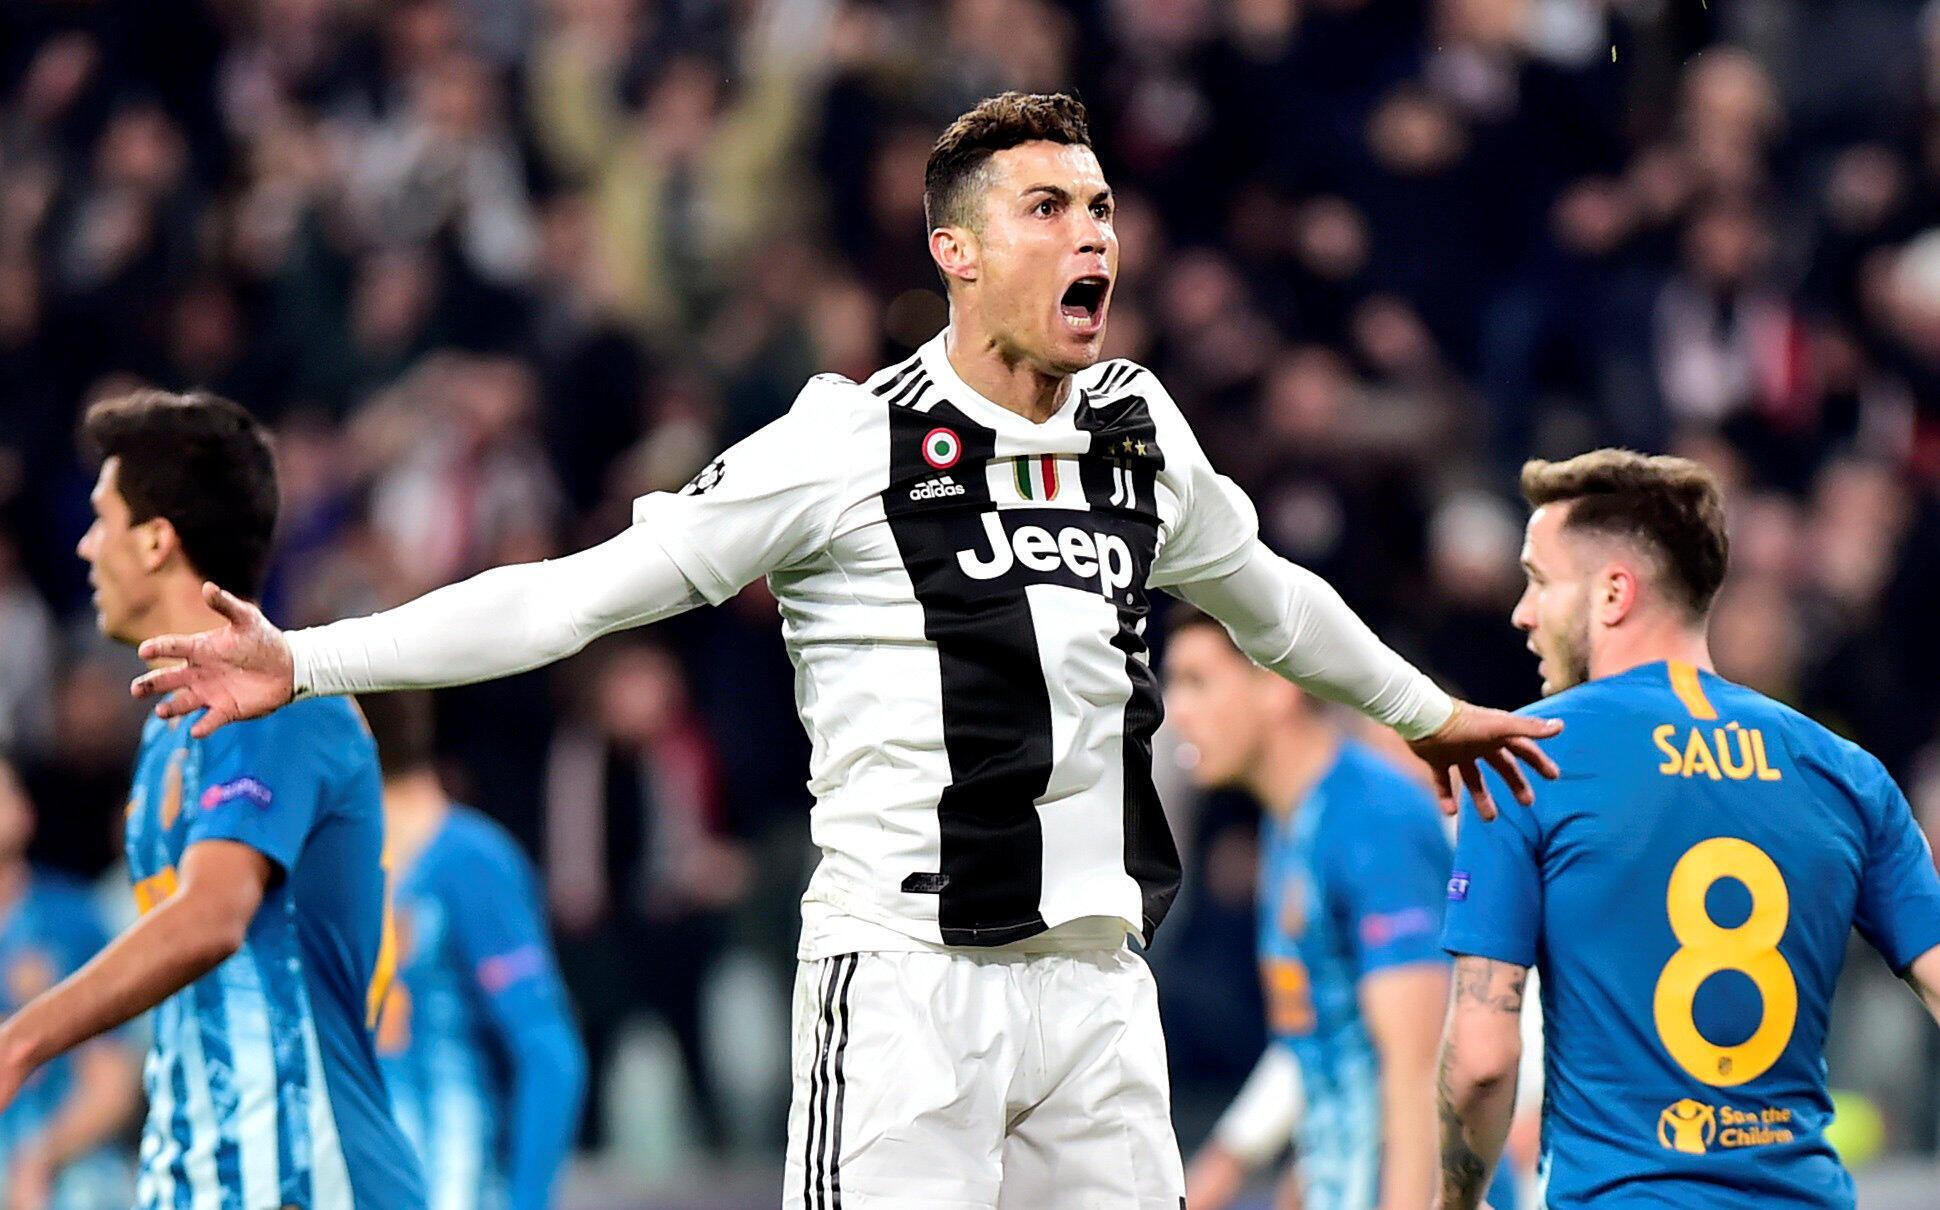 Cristiano Ronaldo yayin murnar jefa kwallo a ragar Atletico Madrid. 12/3/2019.